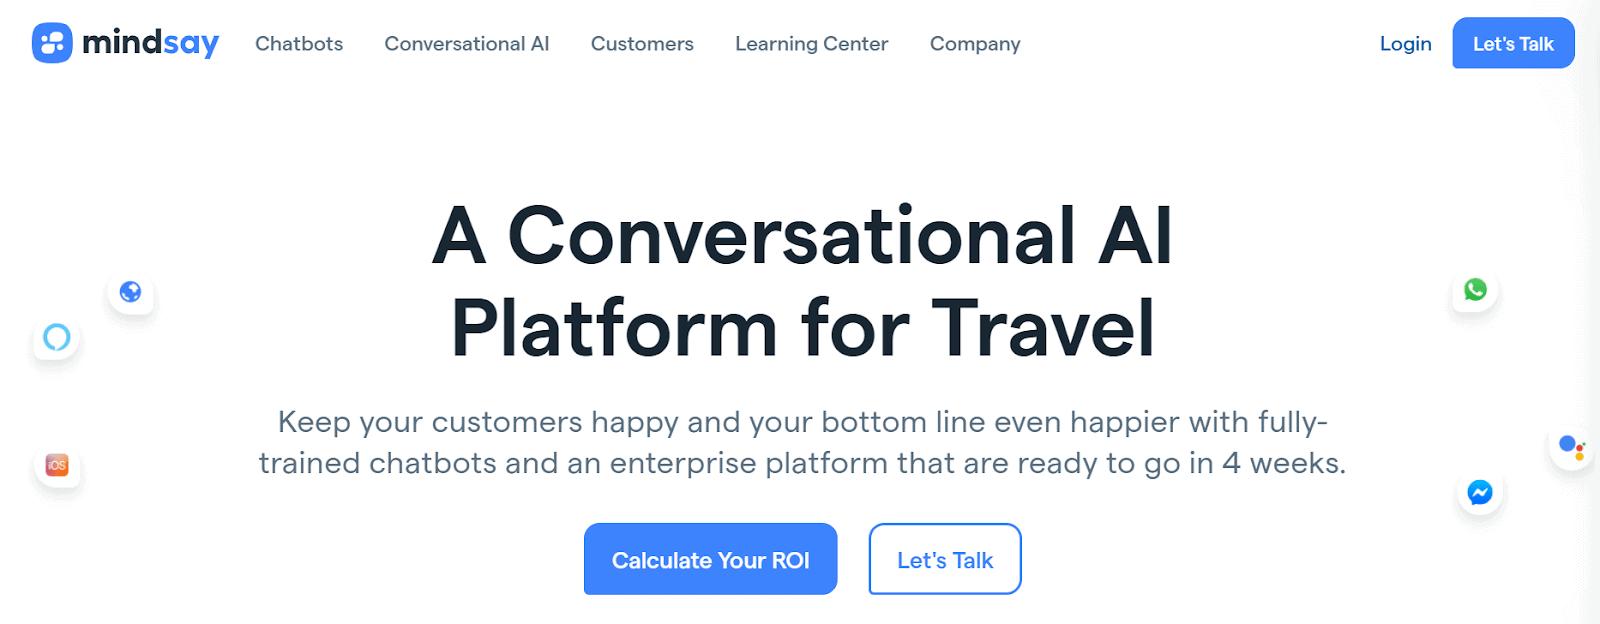 Mindsay Conversational AI Platforms